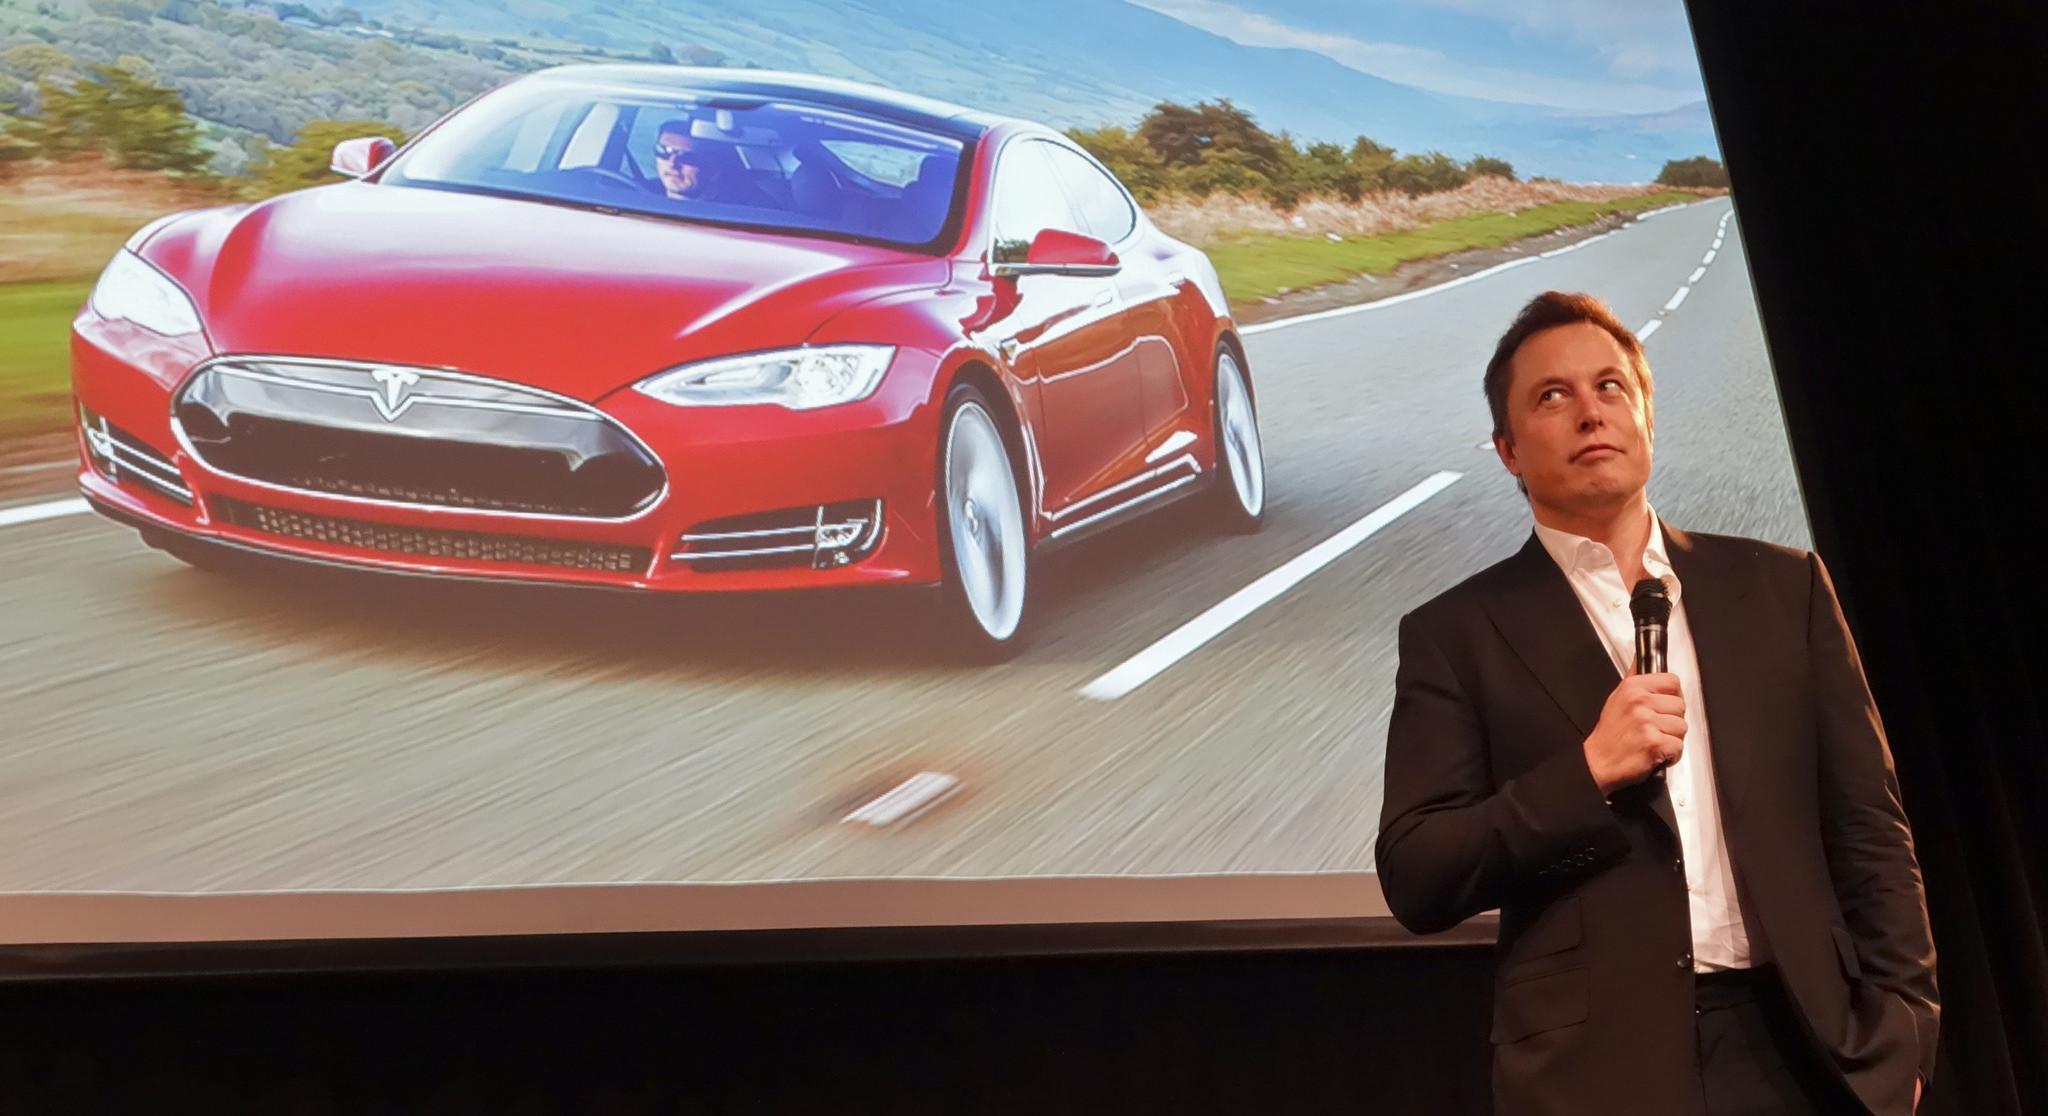 Elon Musk rääkimas Tesla elektriautost. Foto: Steve Jurvetson (CC BY 2.0)